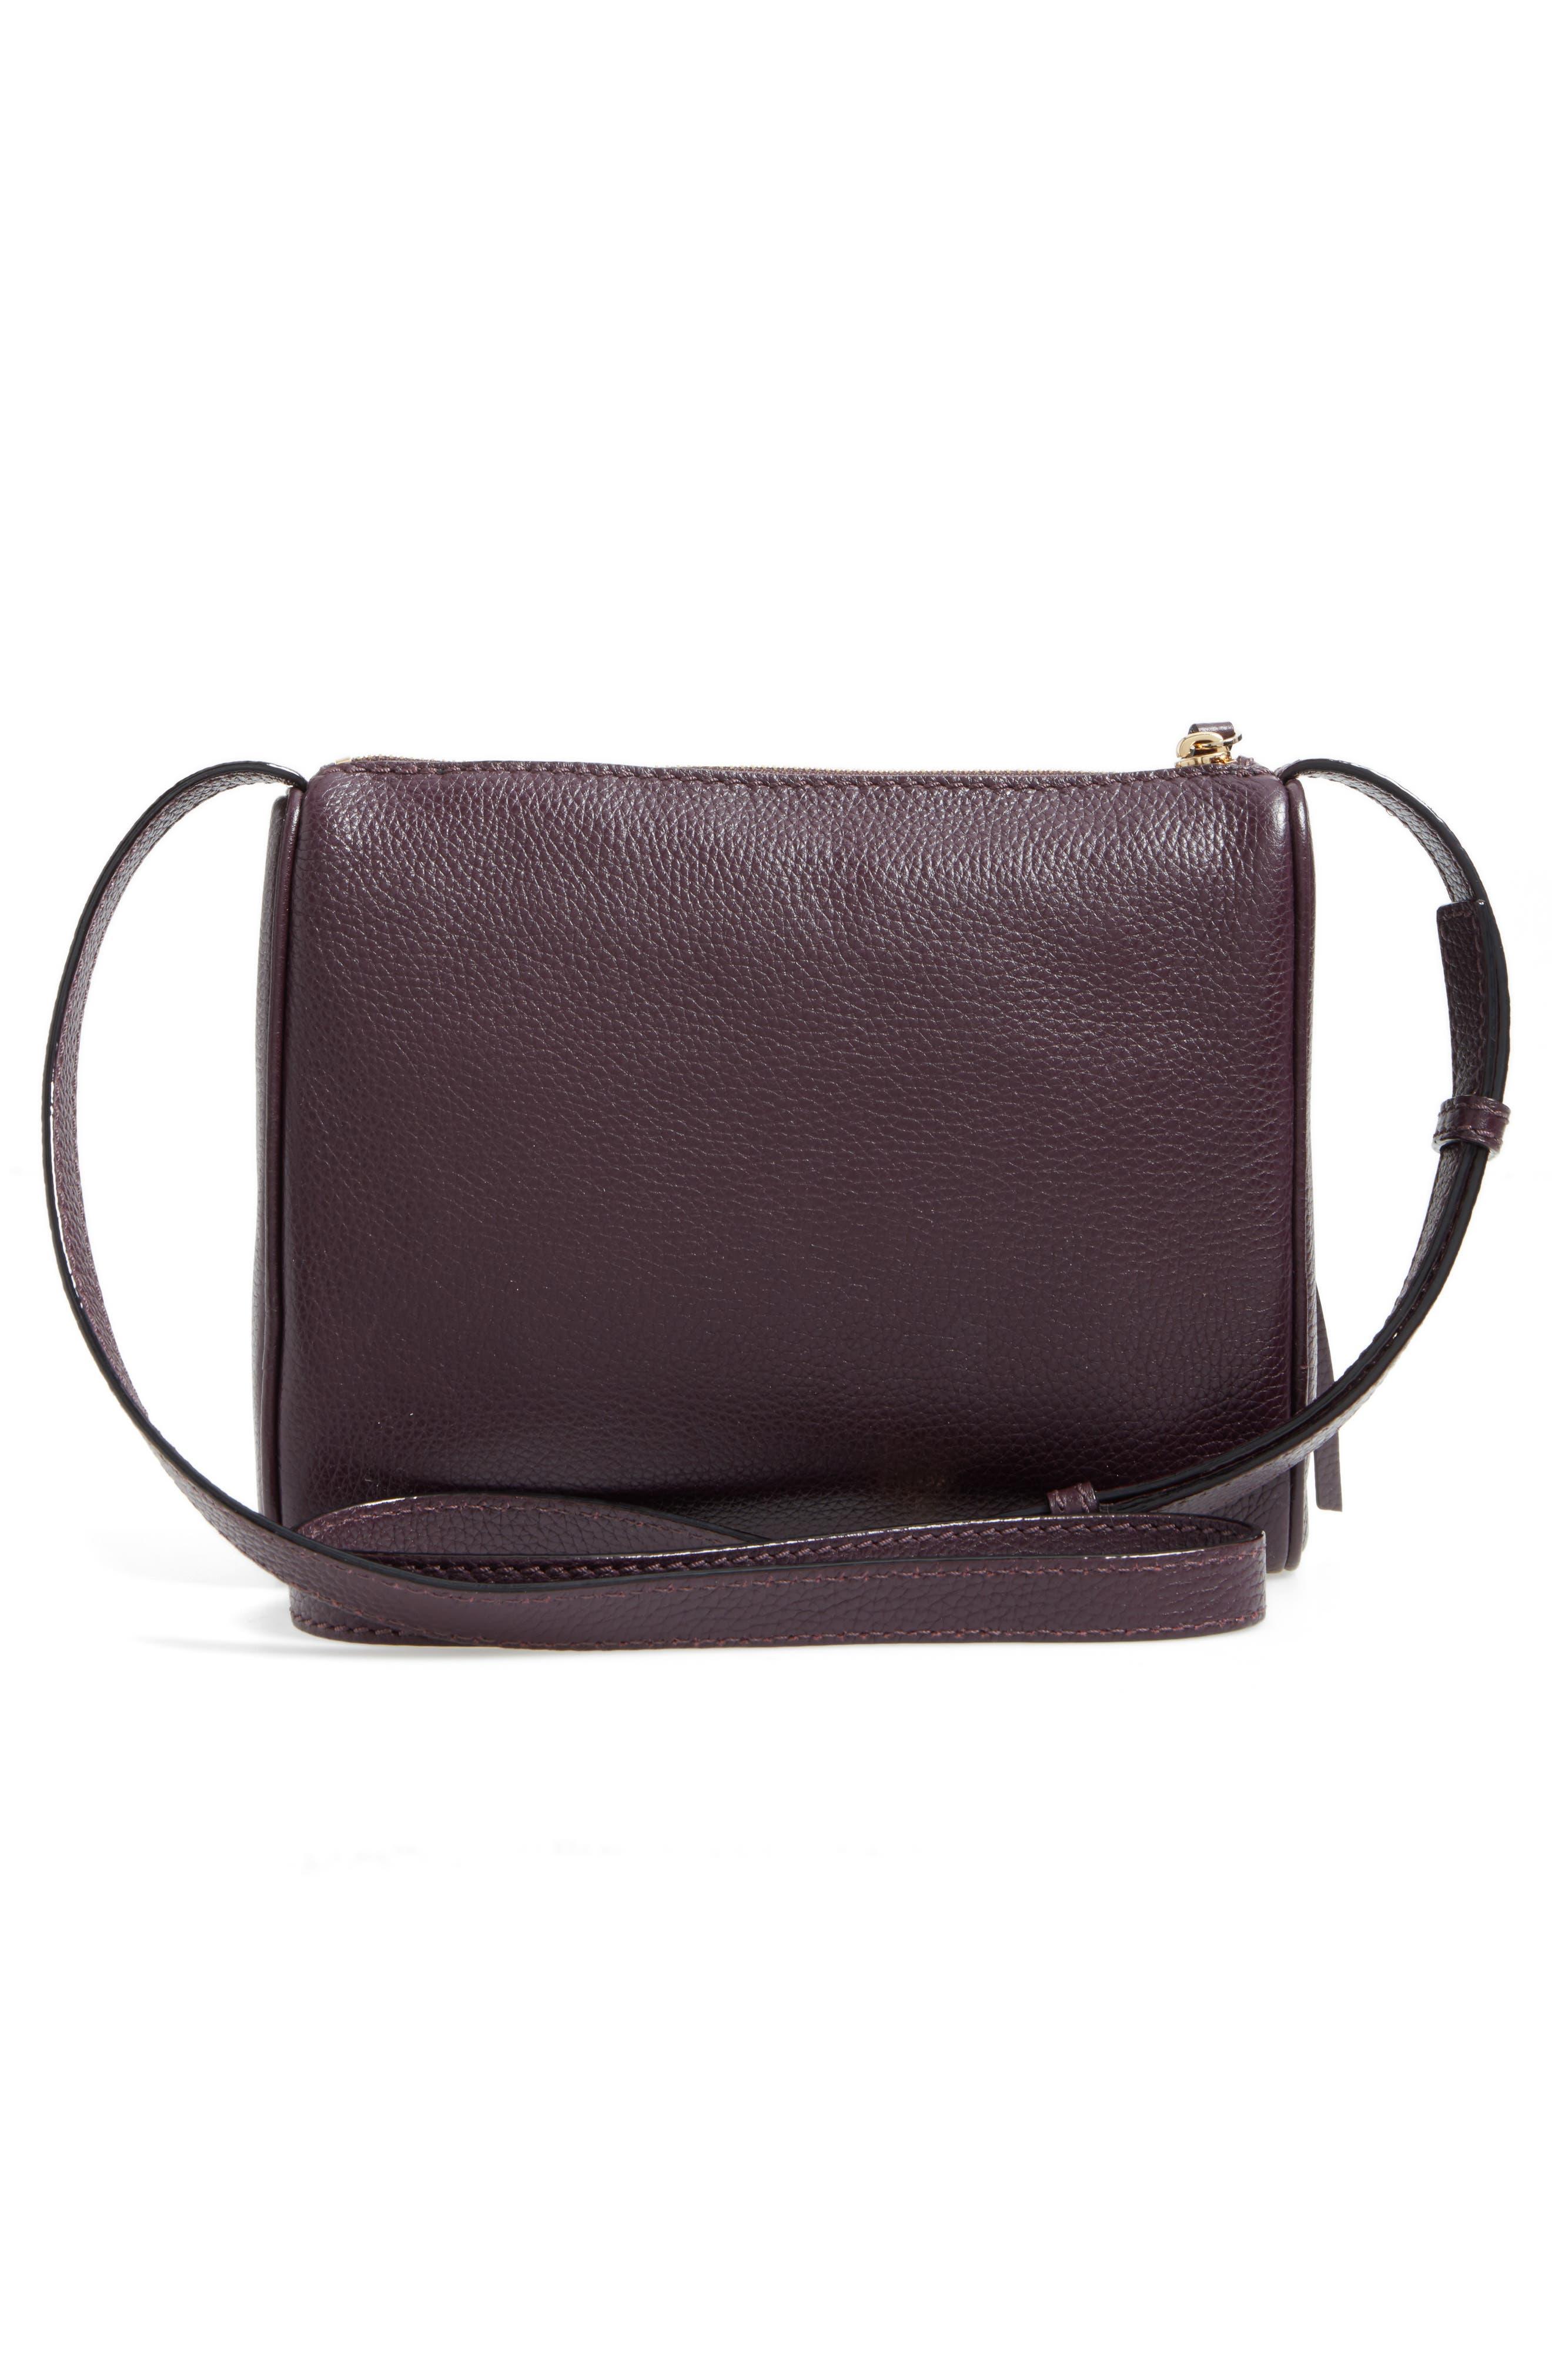 young lane - cayli leather crossbody bag,                             Alternate thumbnail 3, color,                             Dark Mahogany